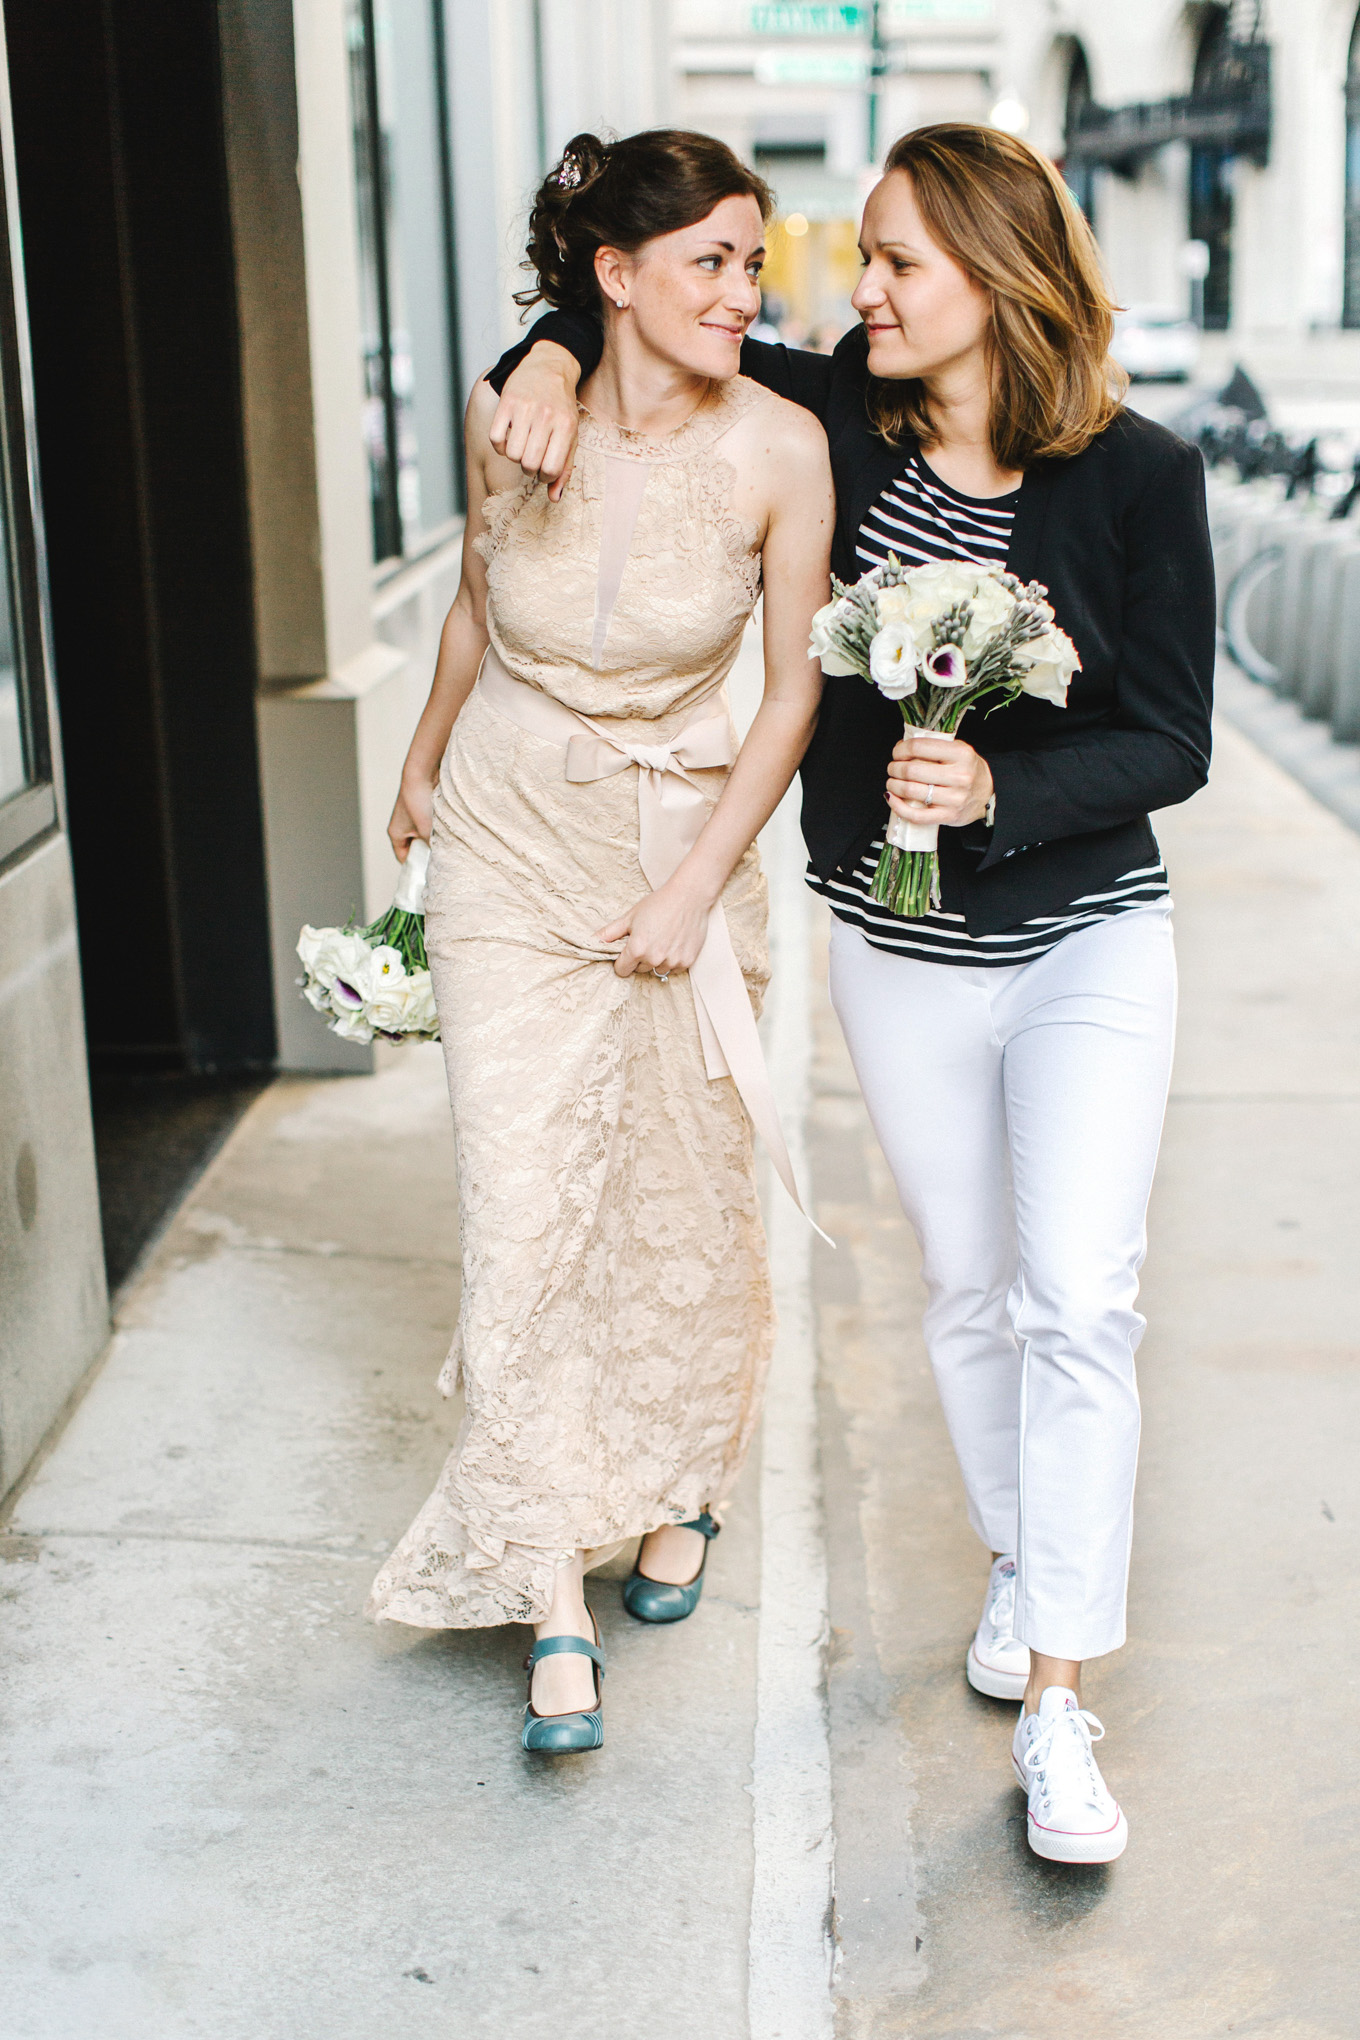 Boston_Wedding_Photographer_Lena_Mirisola-34.jpg